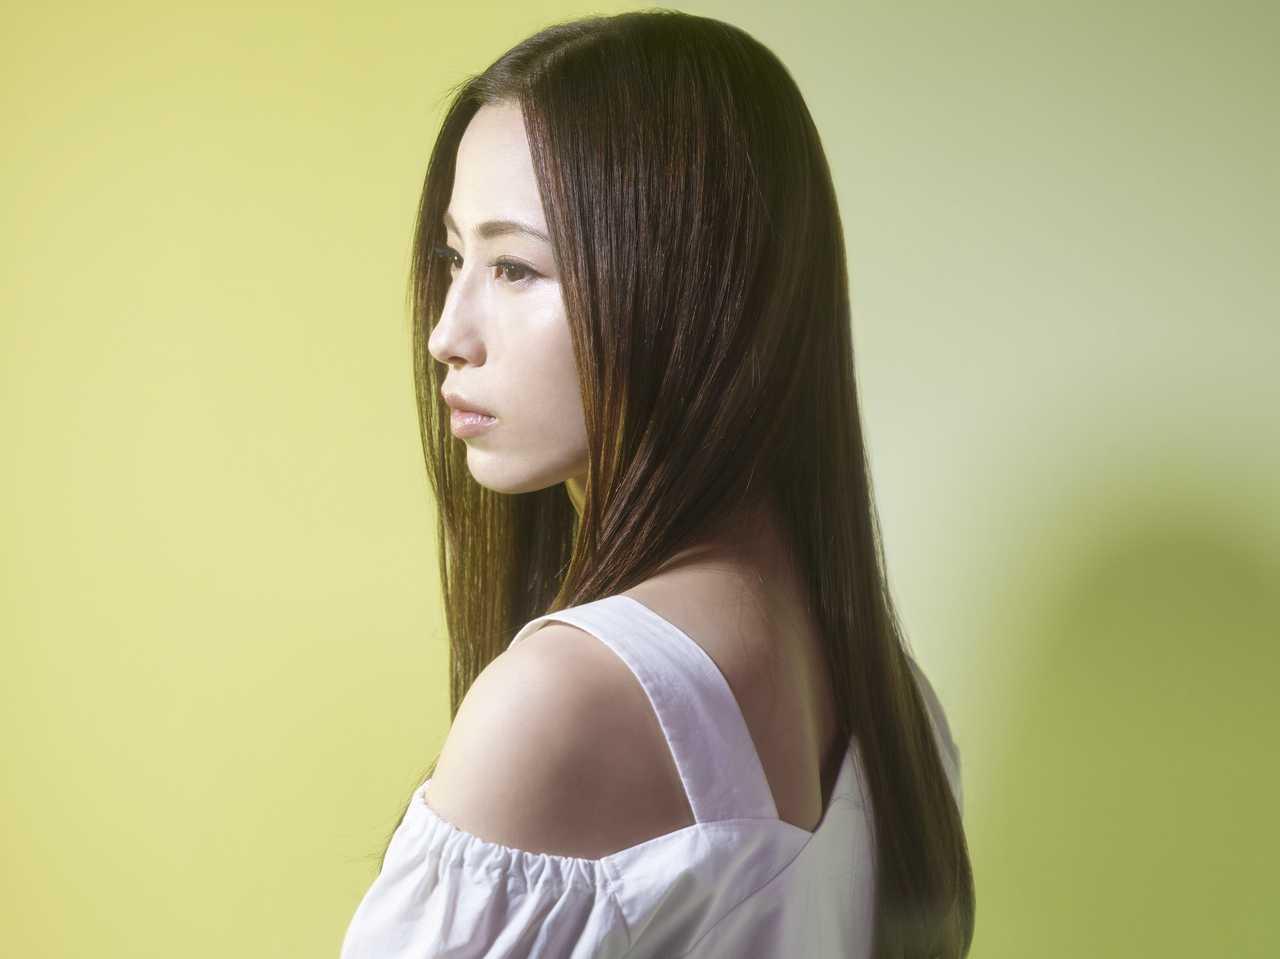 Uru、ドラマ『推しの王子様』主題歌「Love Song」の先行配信が決定!